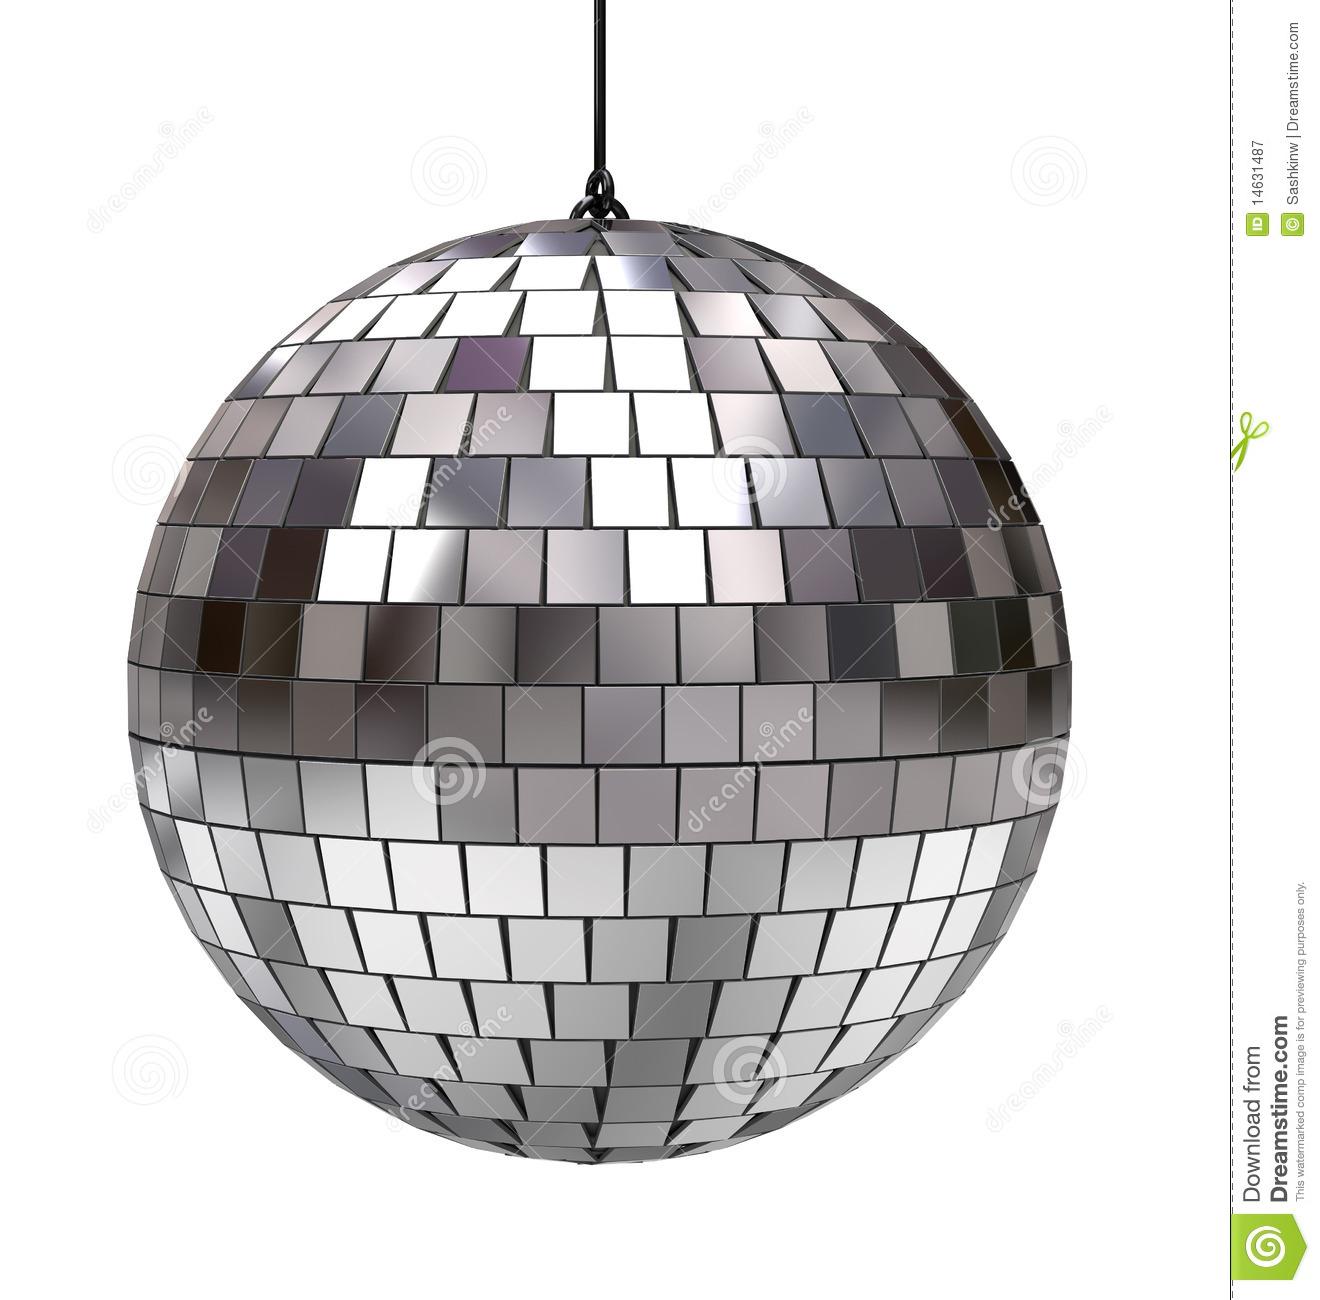 847 Disco free clipart.